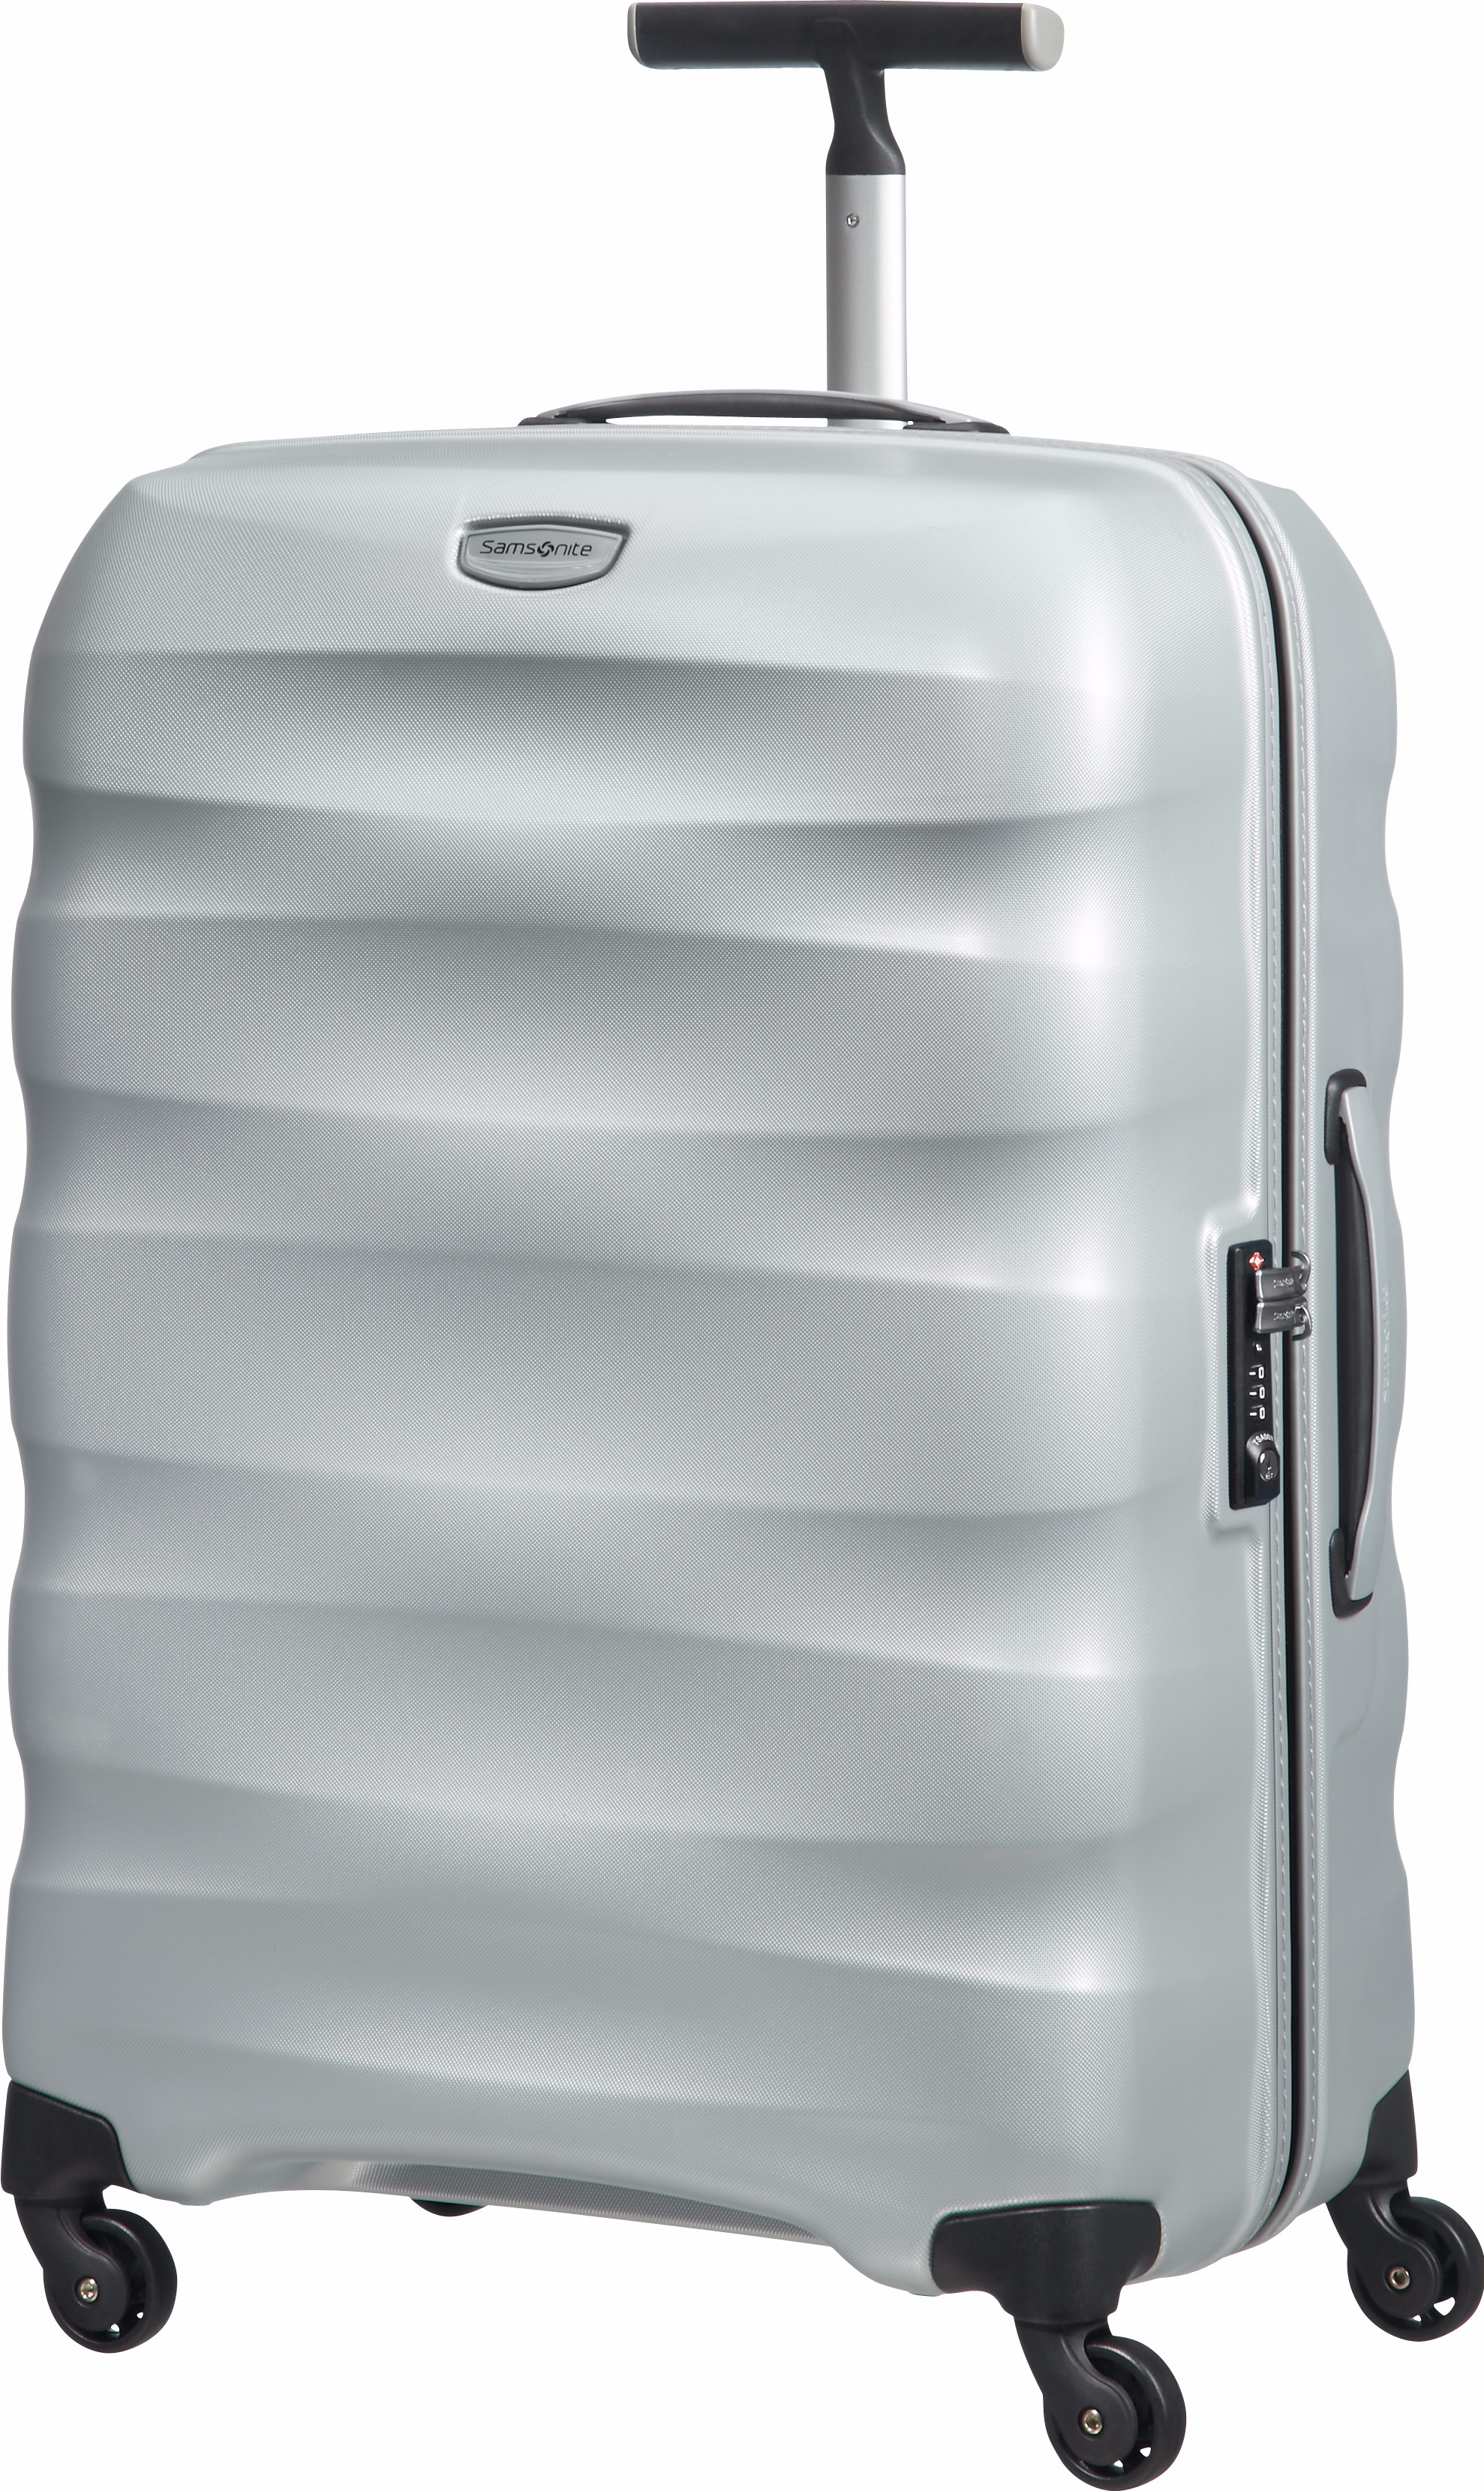 handbagage koffer 55x40x20 trendy samsonite with handbagage koffer 55x40x20 best frenkla. Black Bedroom Furniture Sets. Home Design Ideas